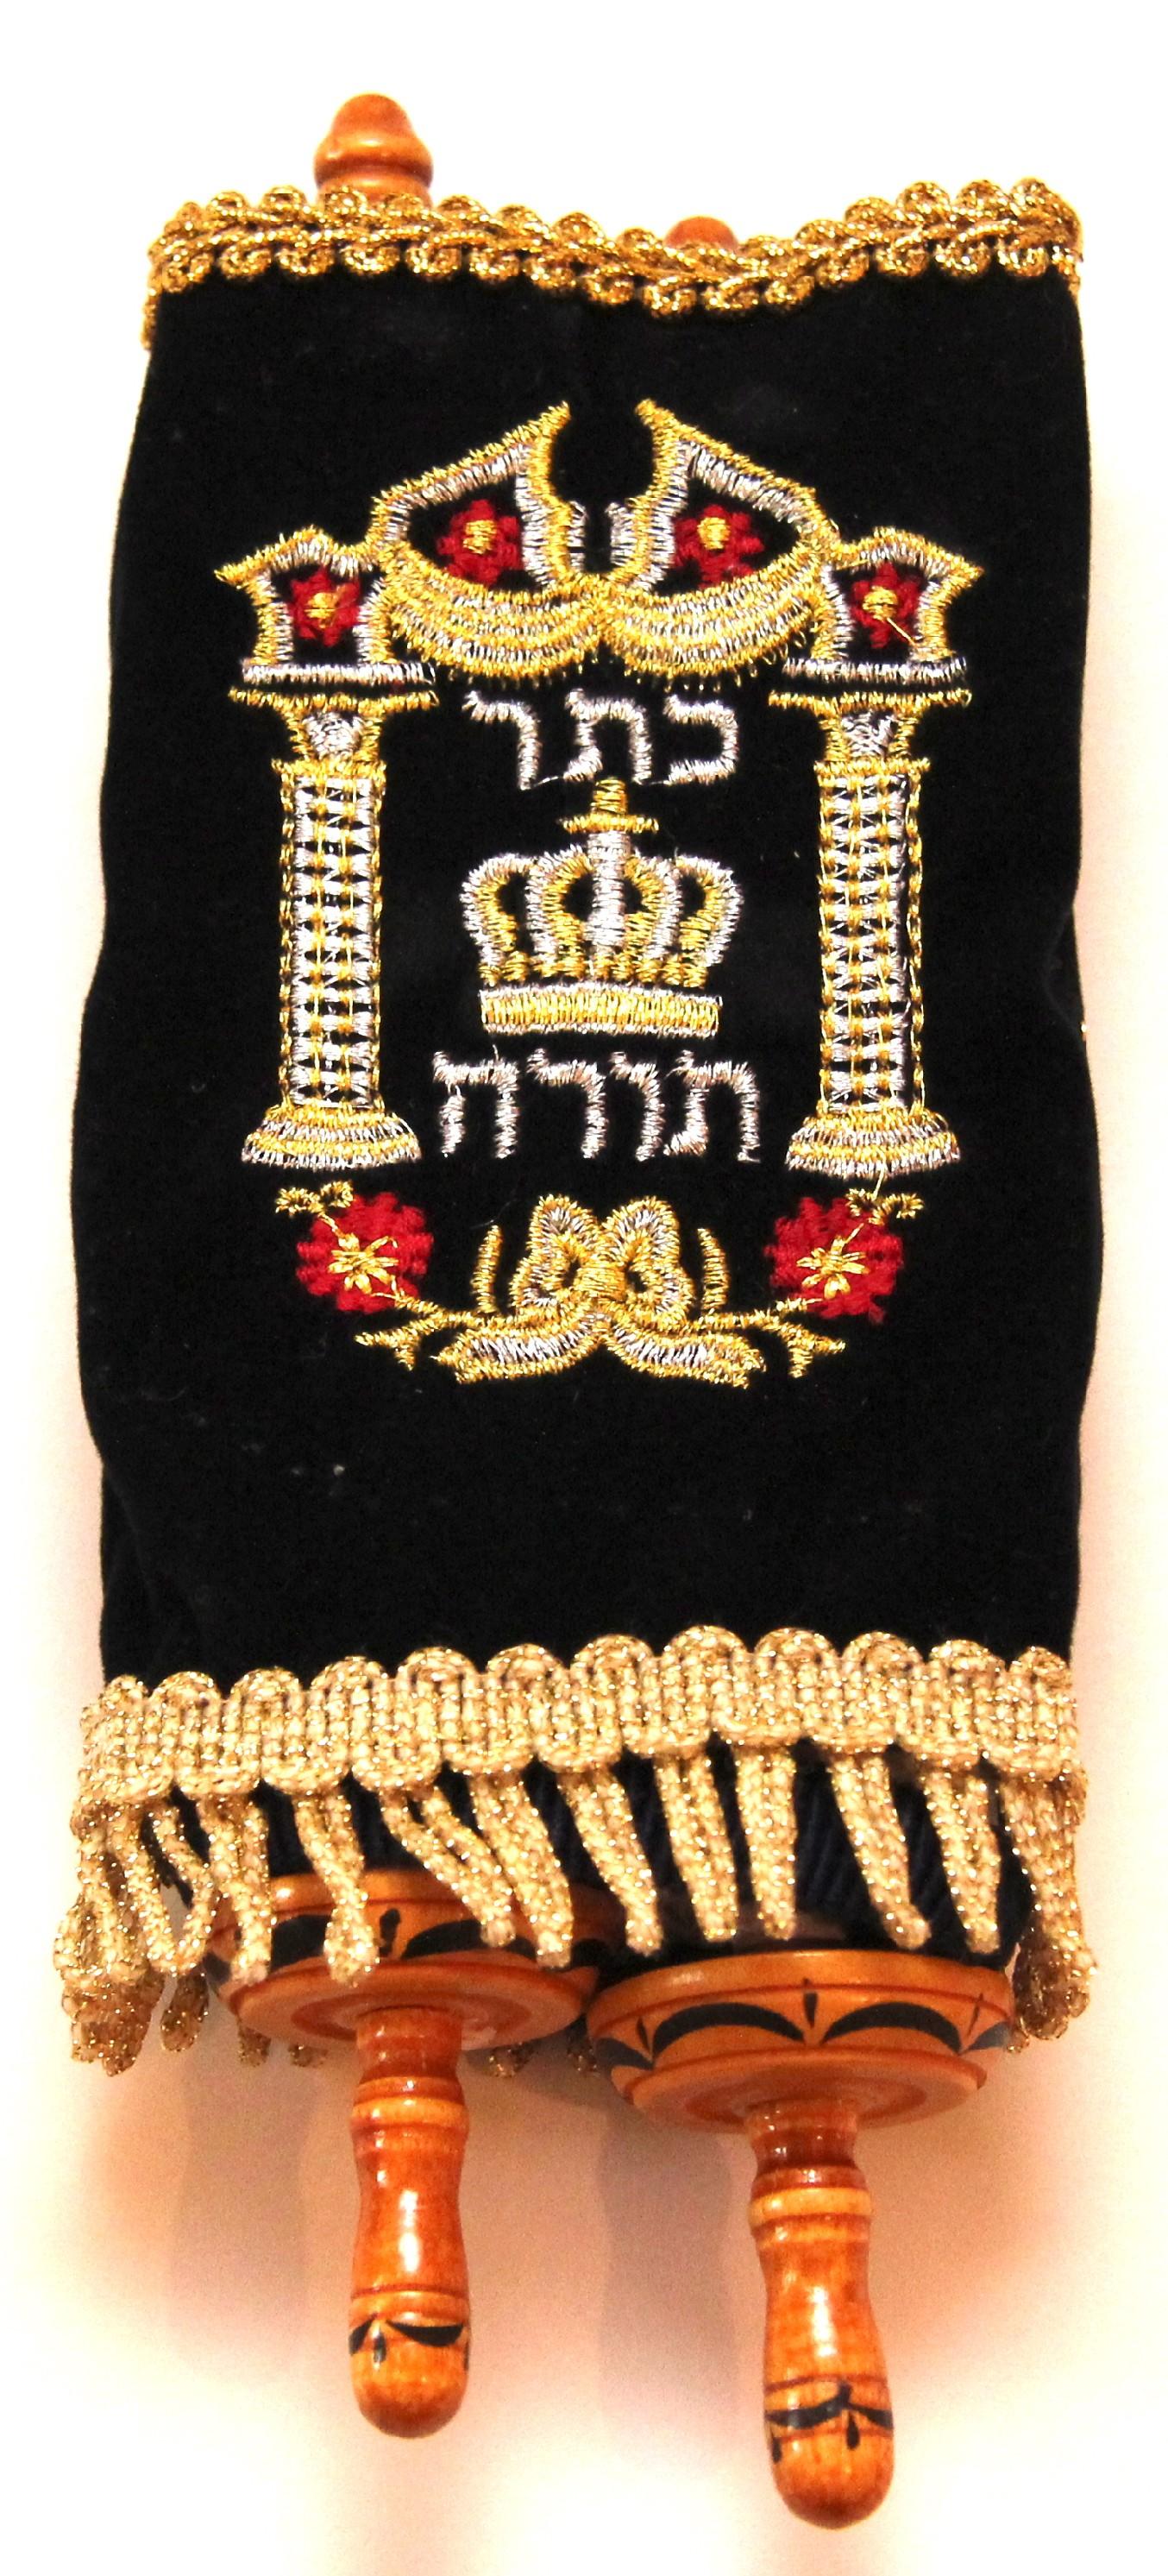 Tóra - Torah